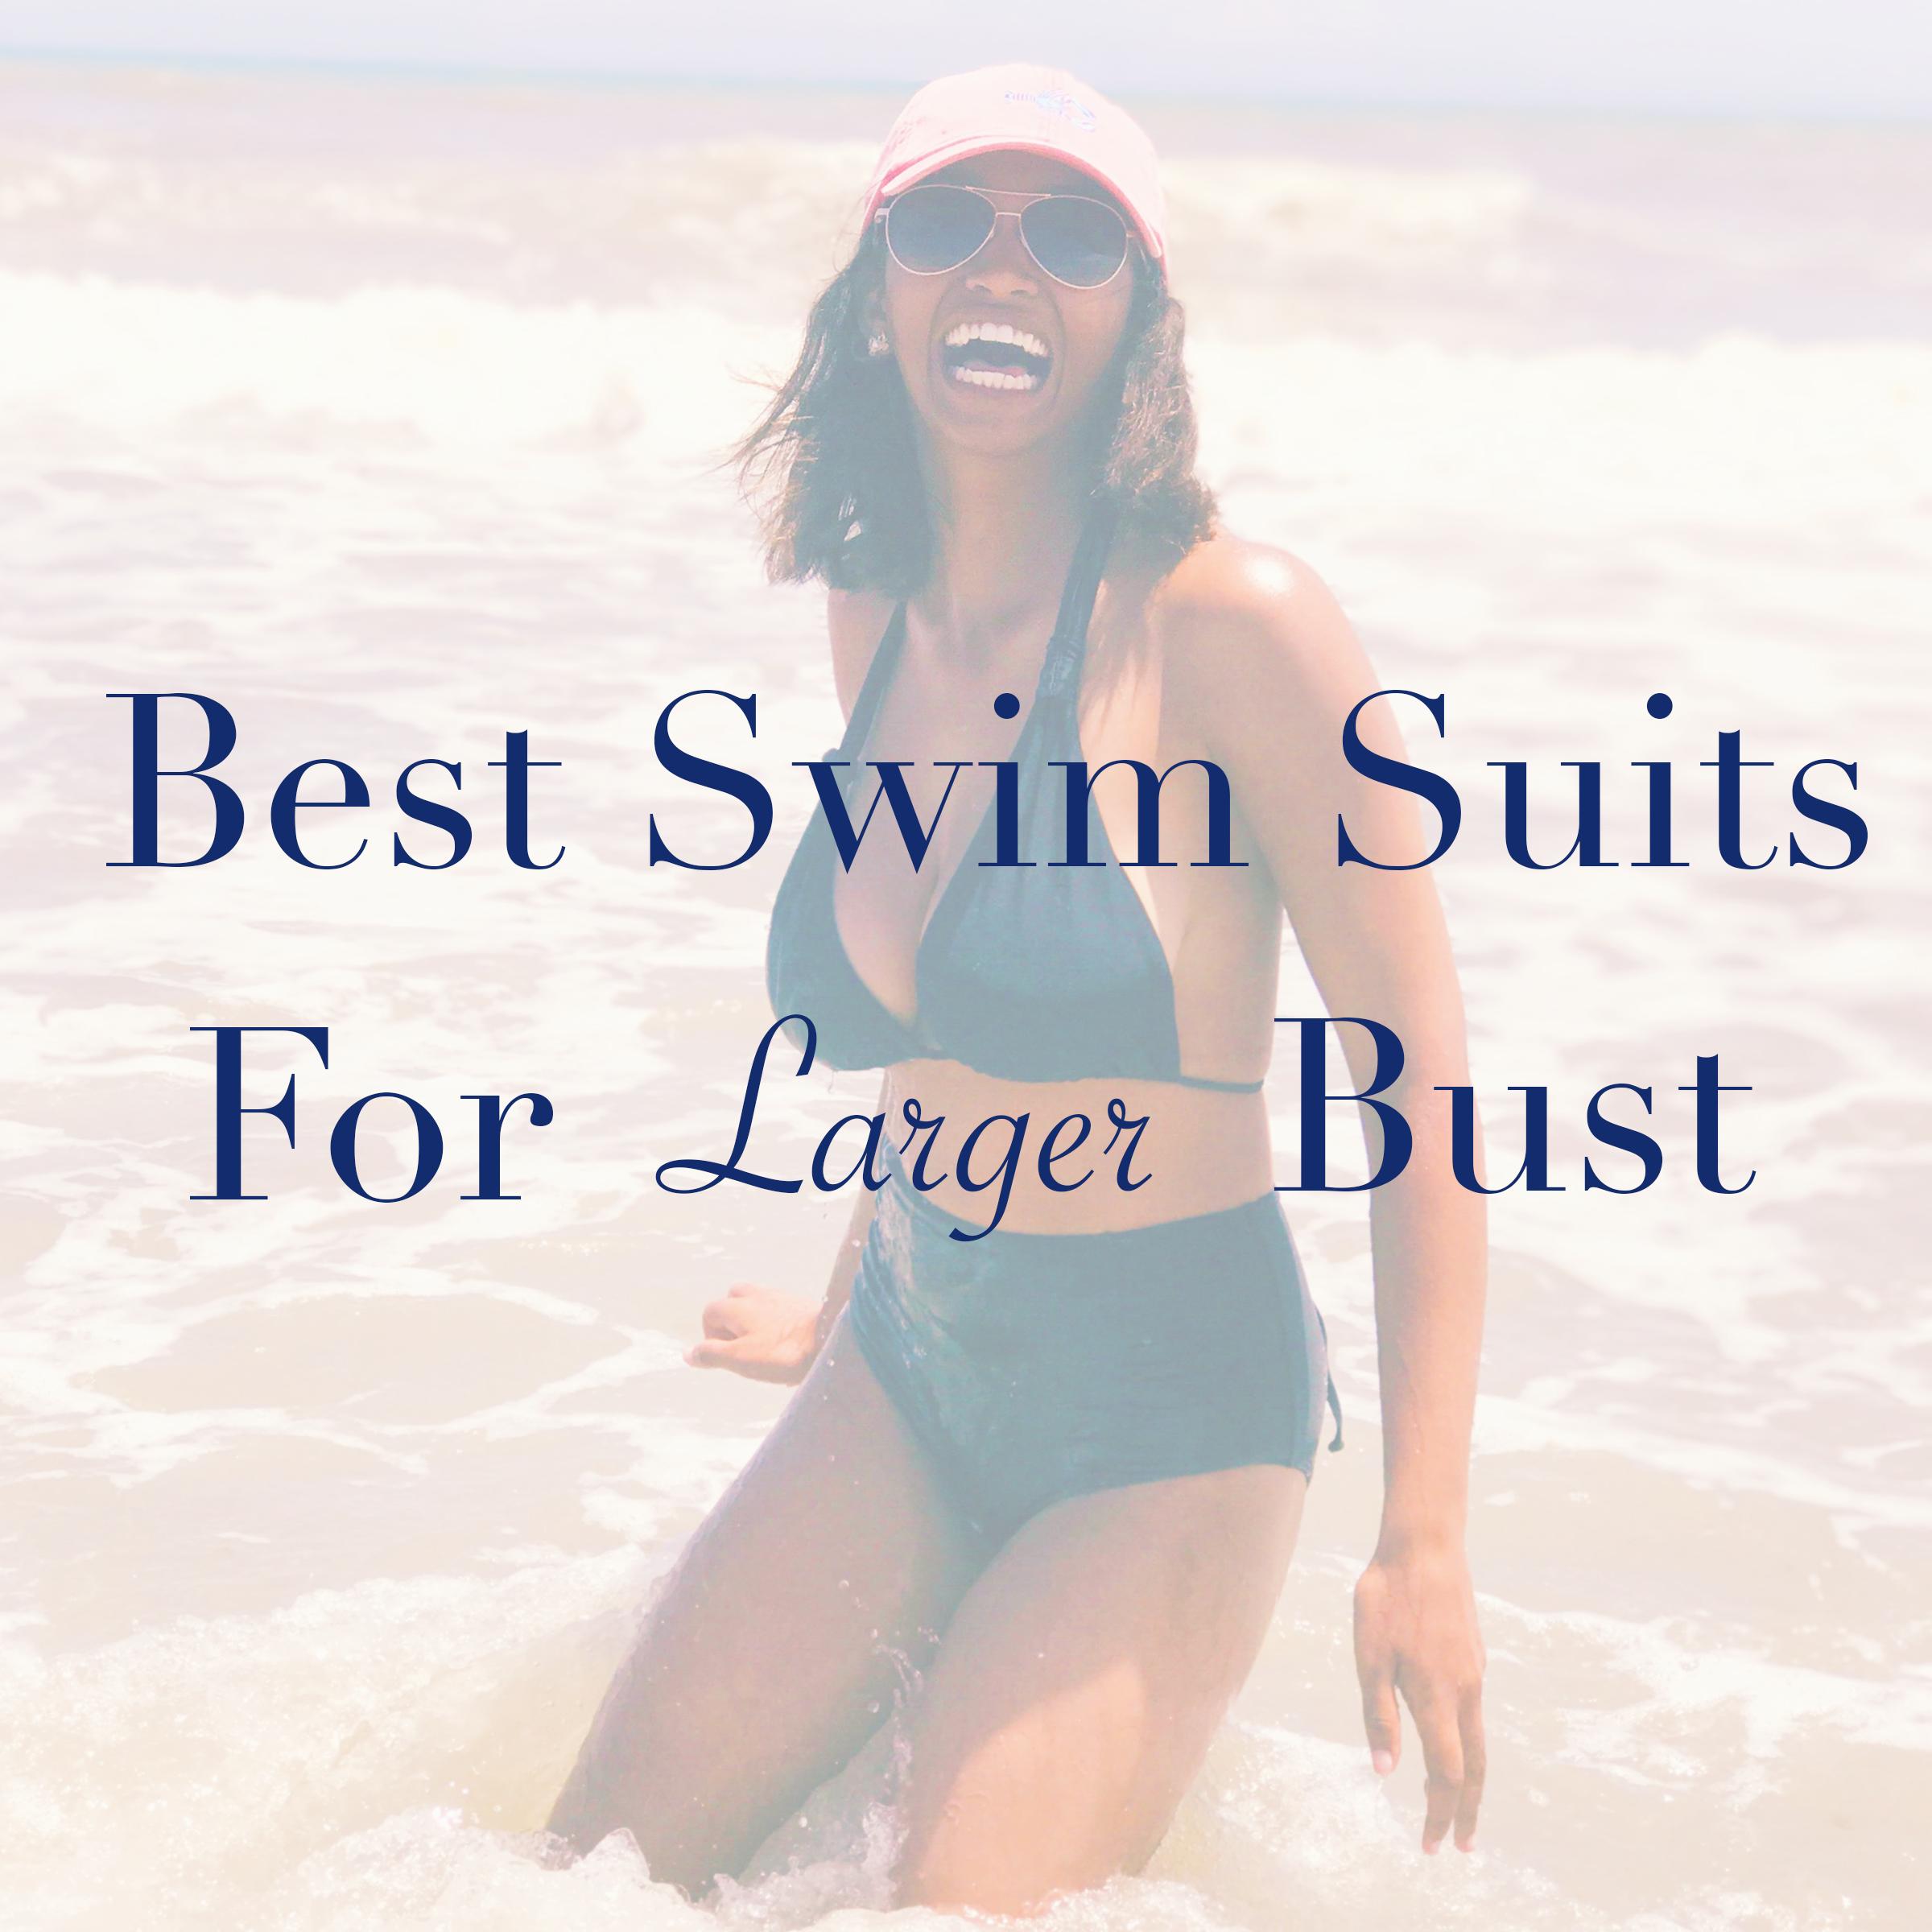 Best Swim Suits For Larger Bust